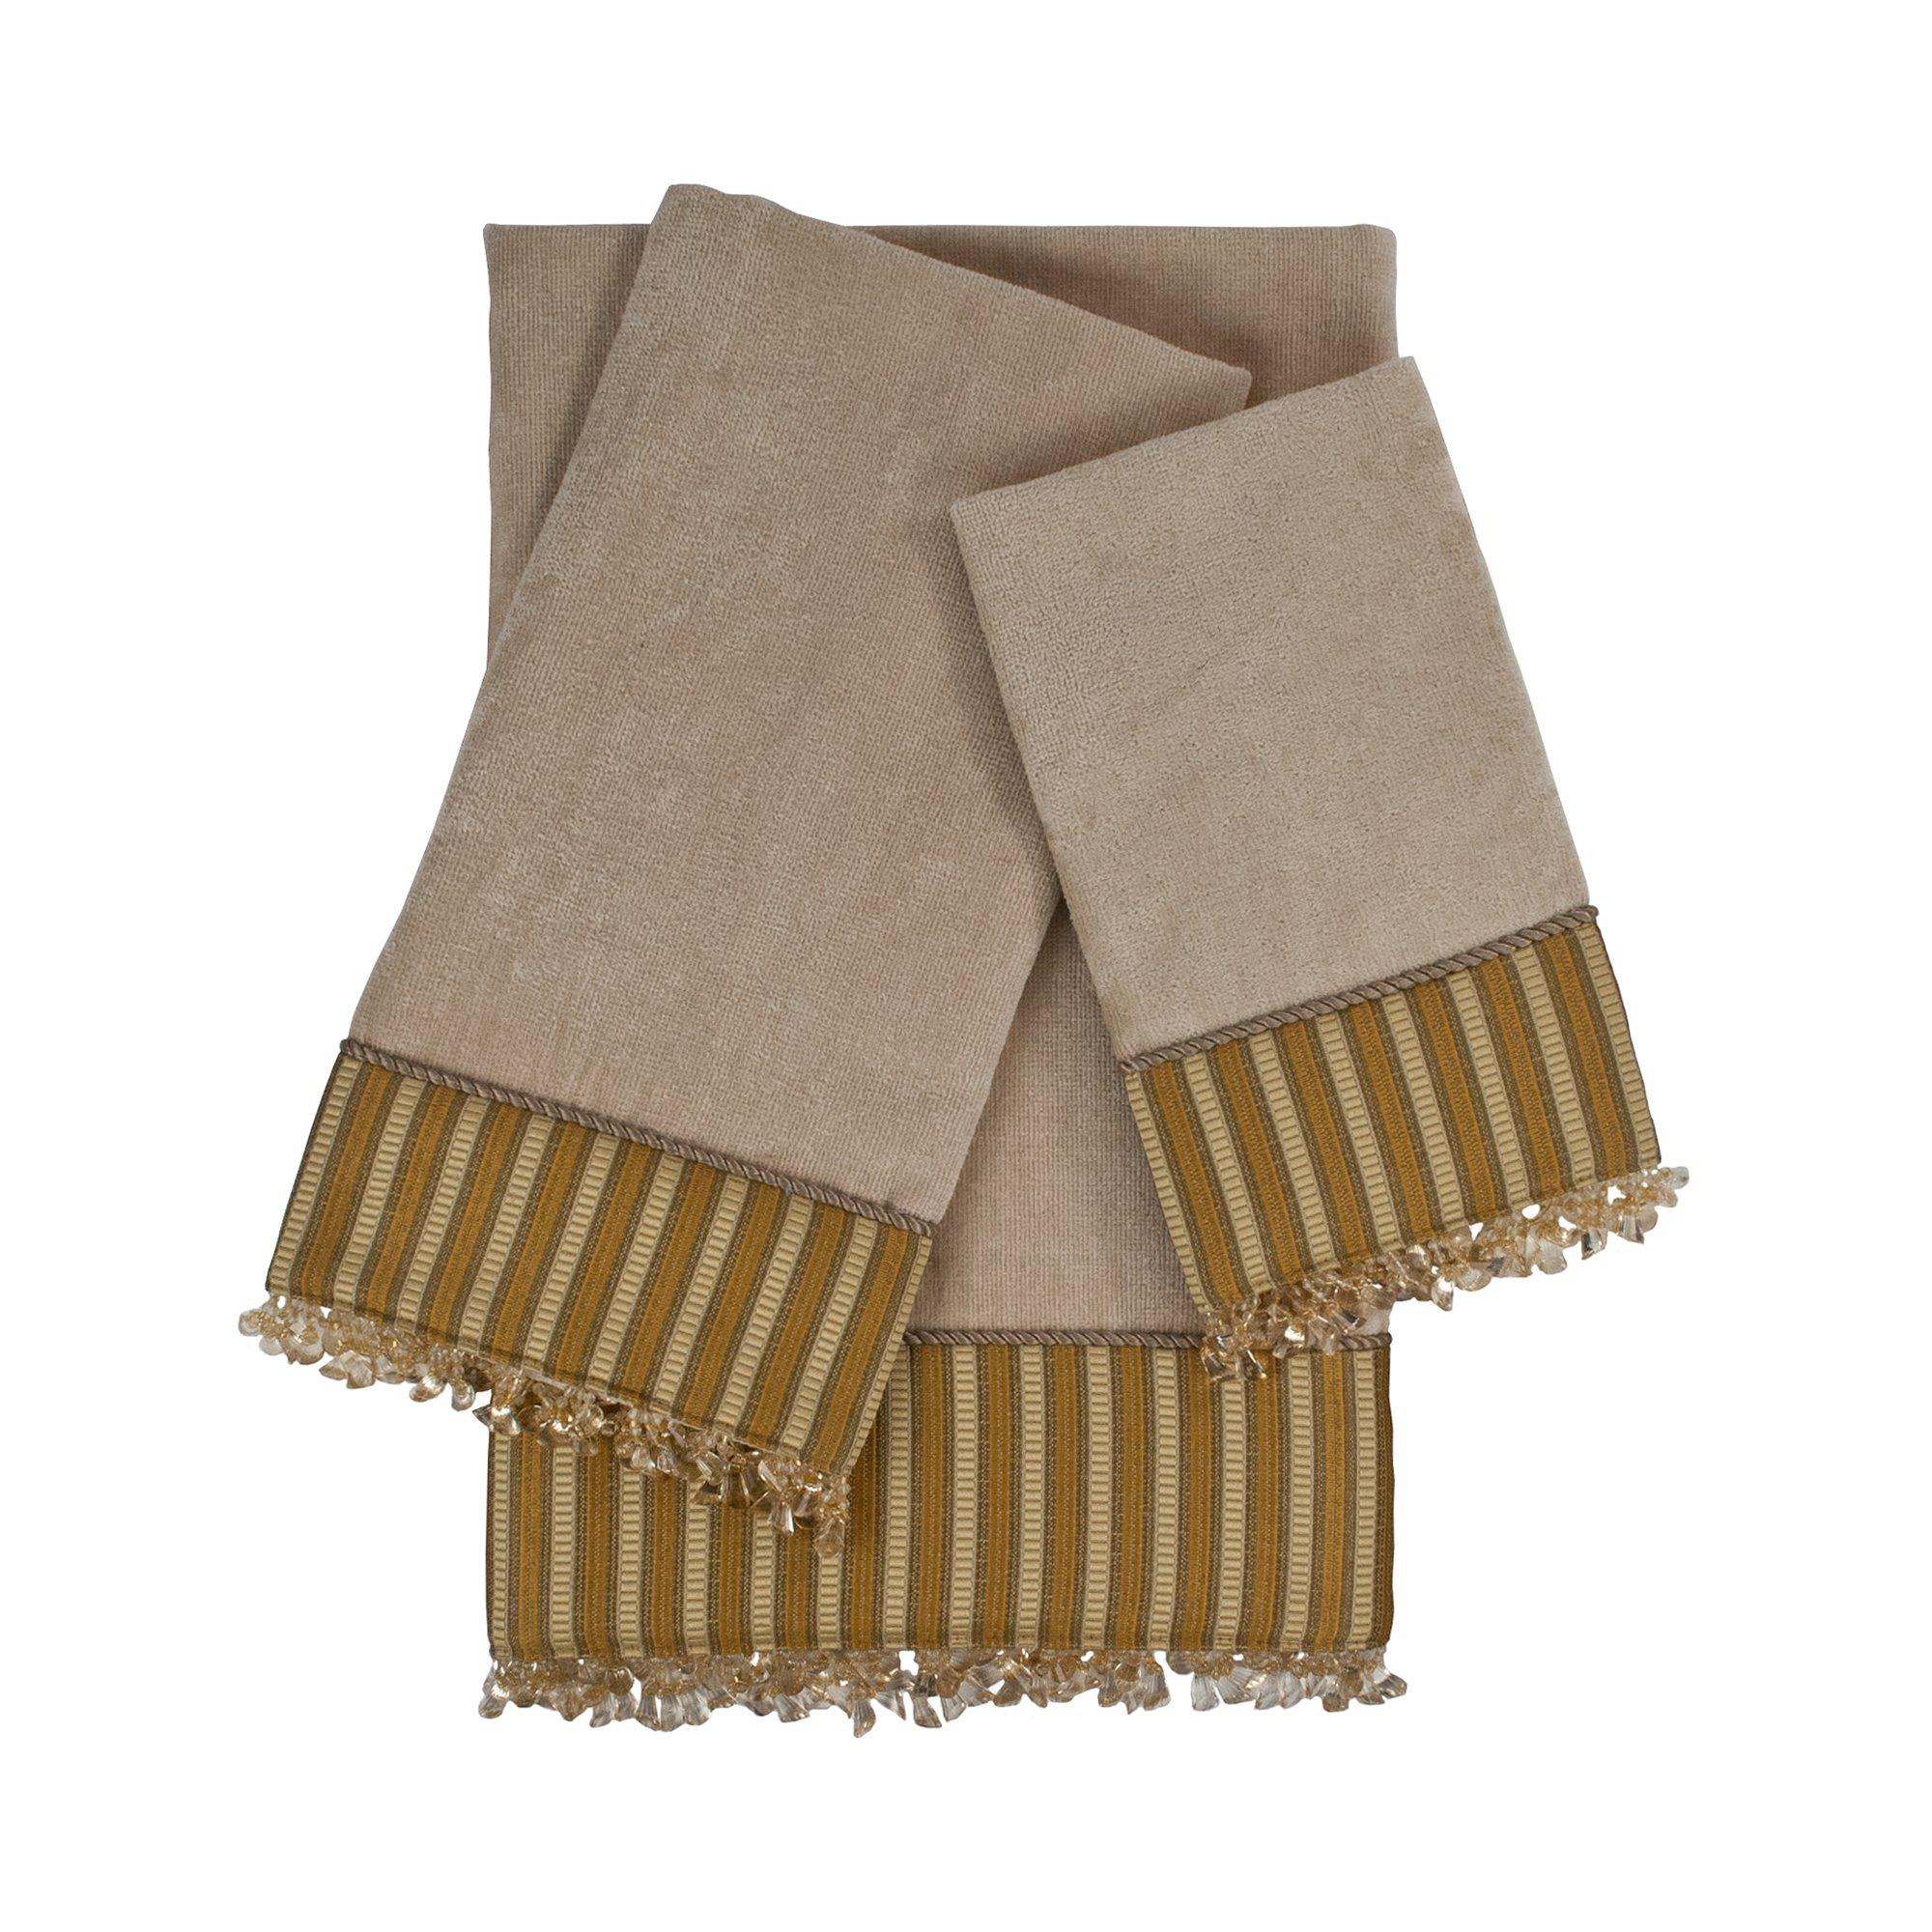 Sherry Kline 3 Piece Mulligan Embellished Towel Set, Taupe